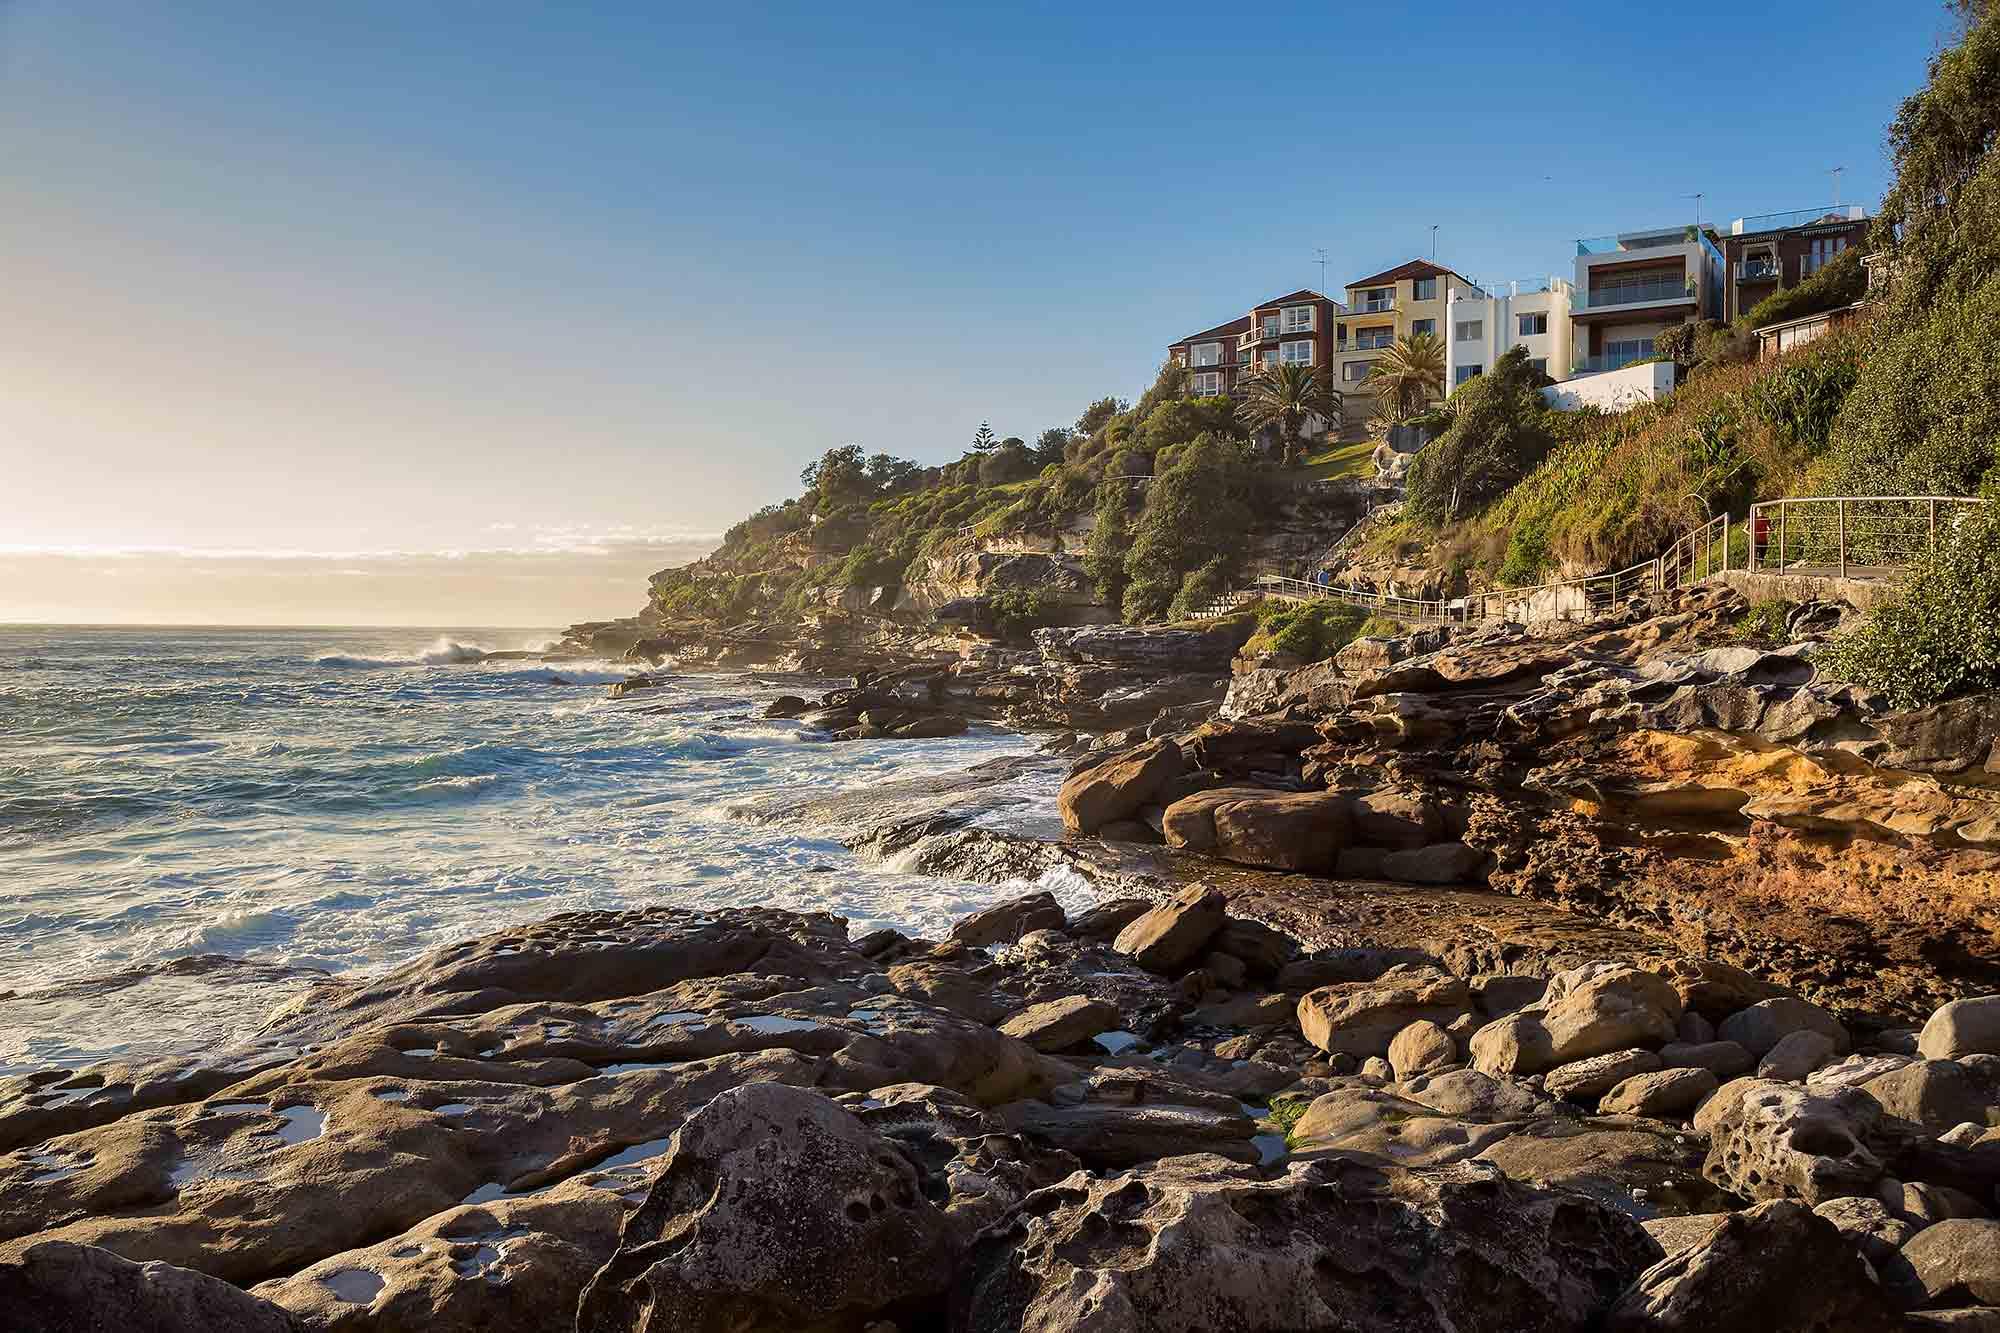 Sydney Coastal Walk. © Ulli Maier & Nisa Maier